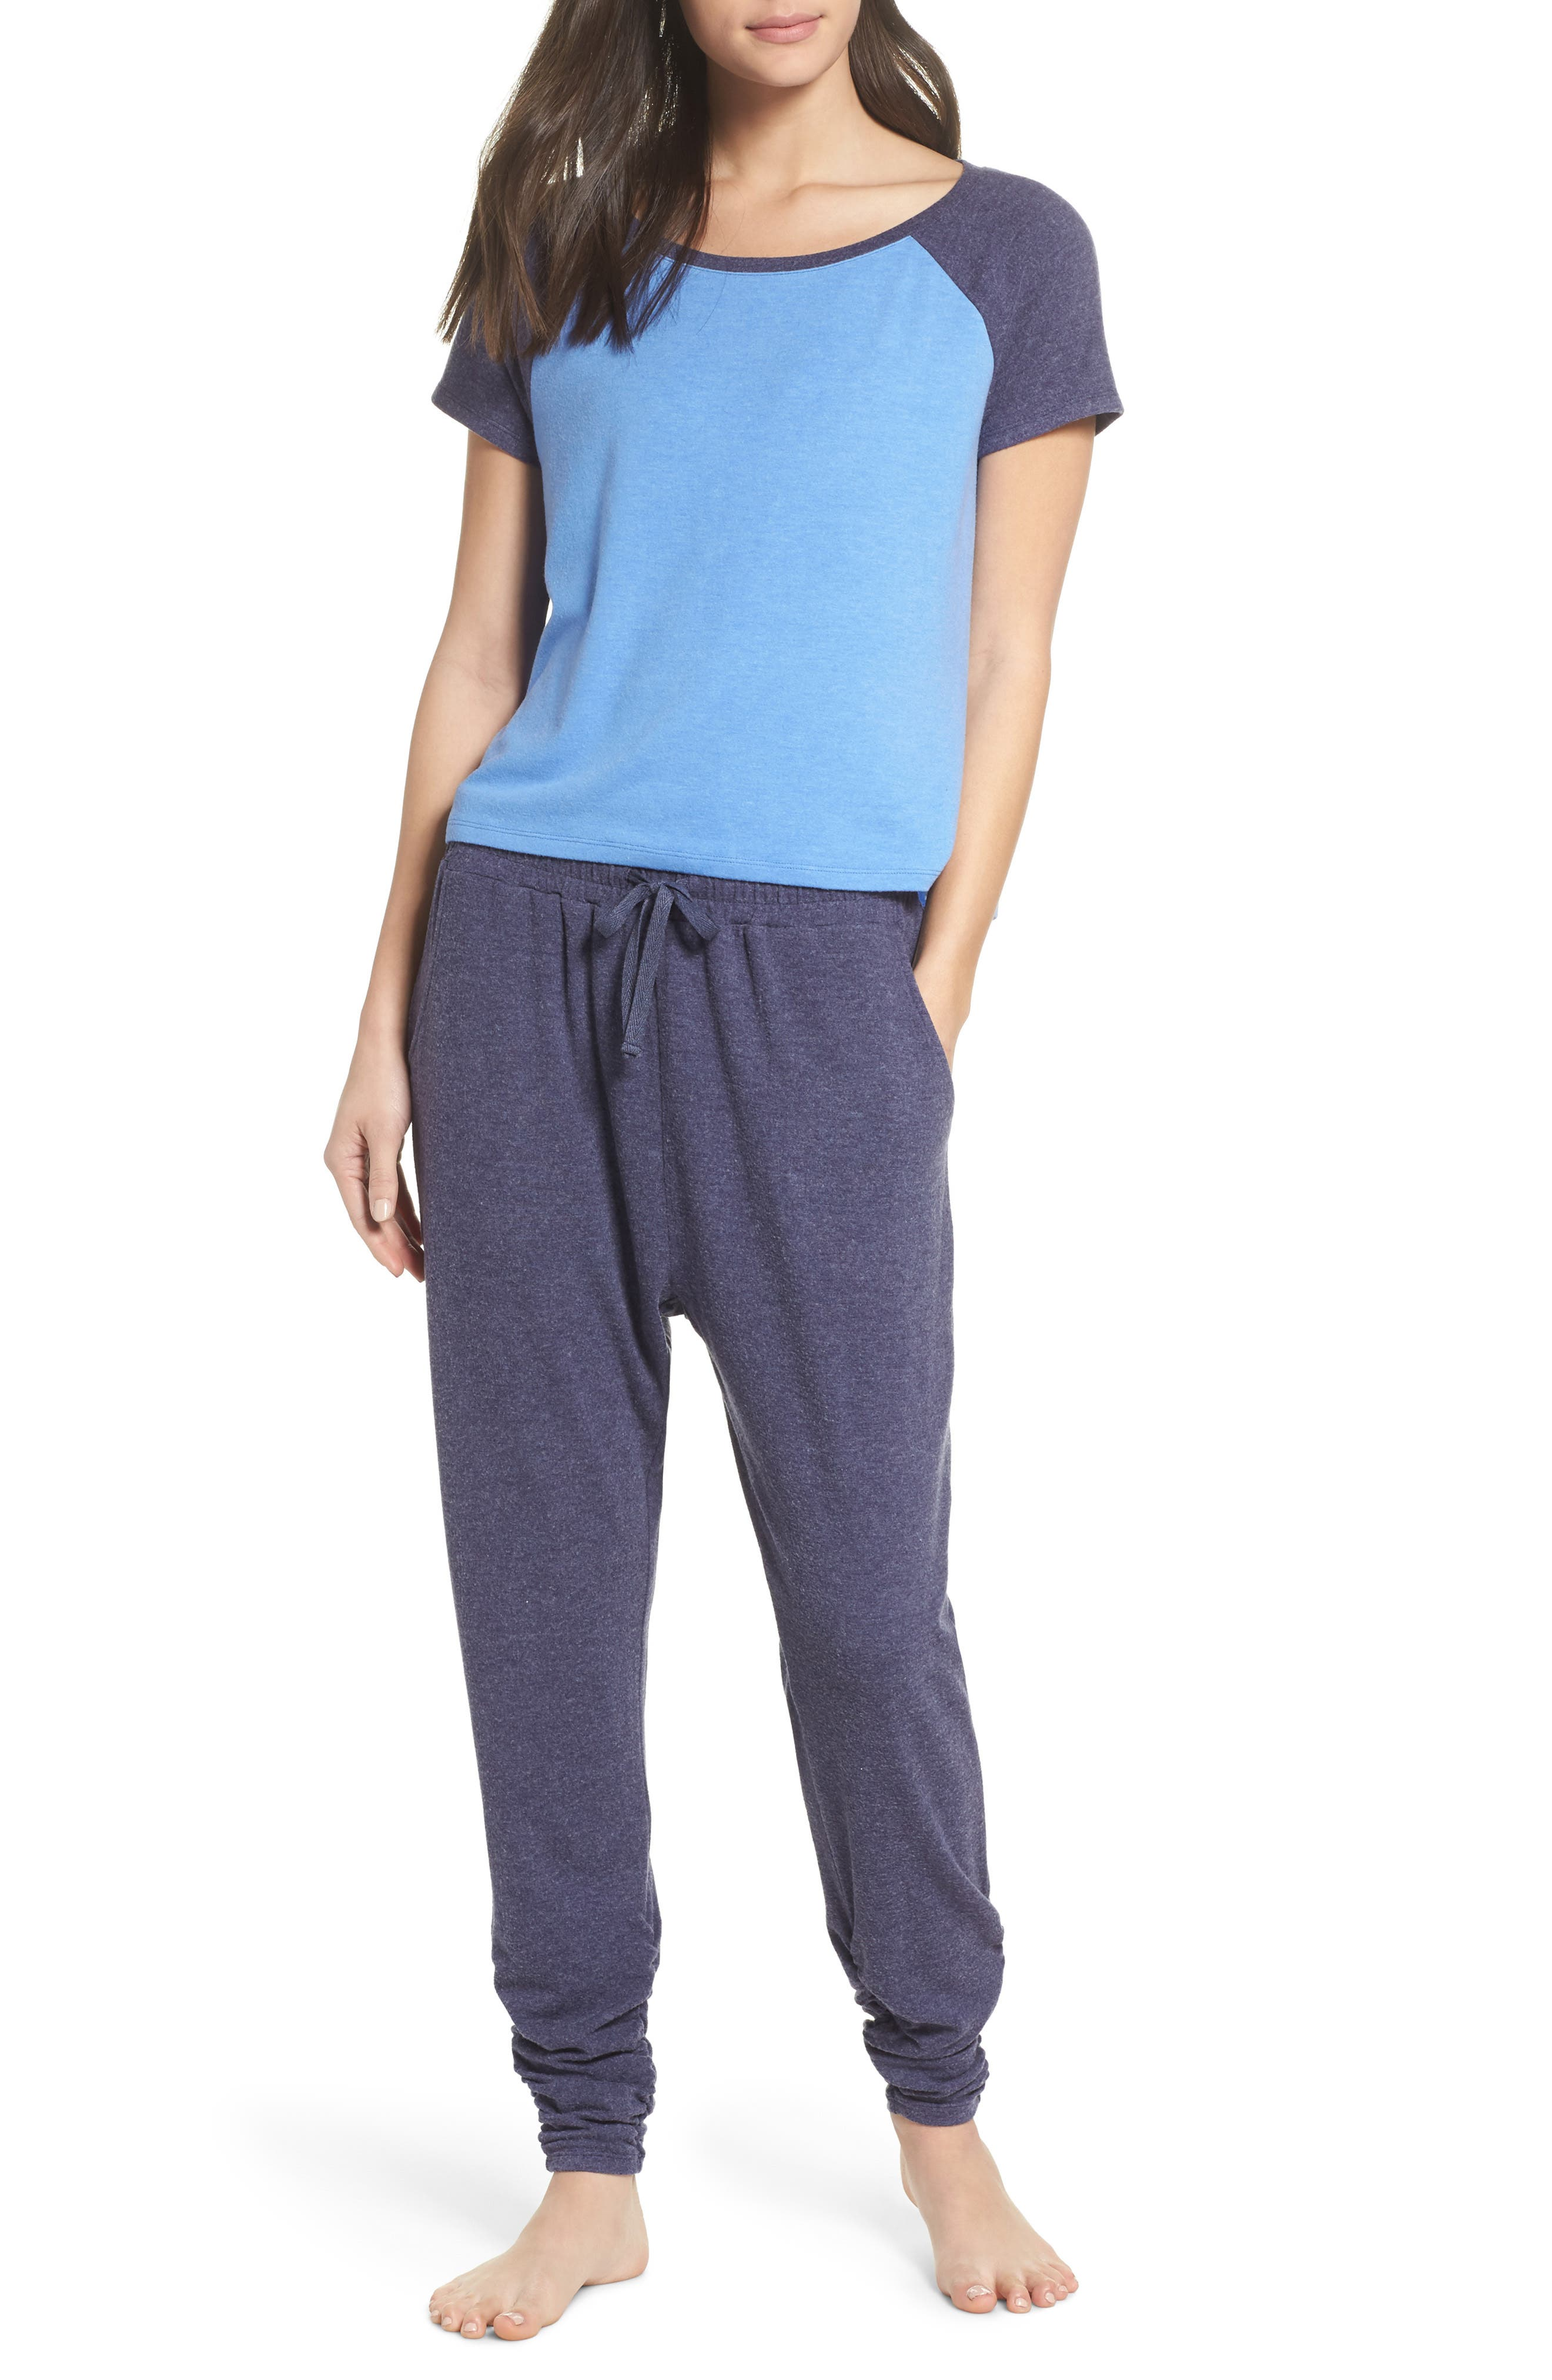 Cloud 9 Pajamas,                         Main,                         color, Blue Azurite